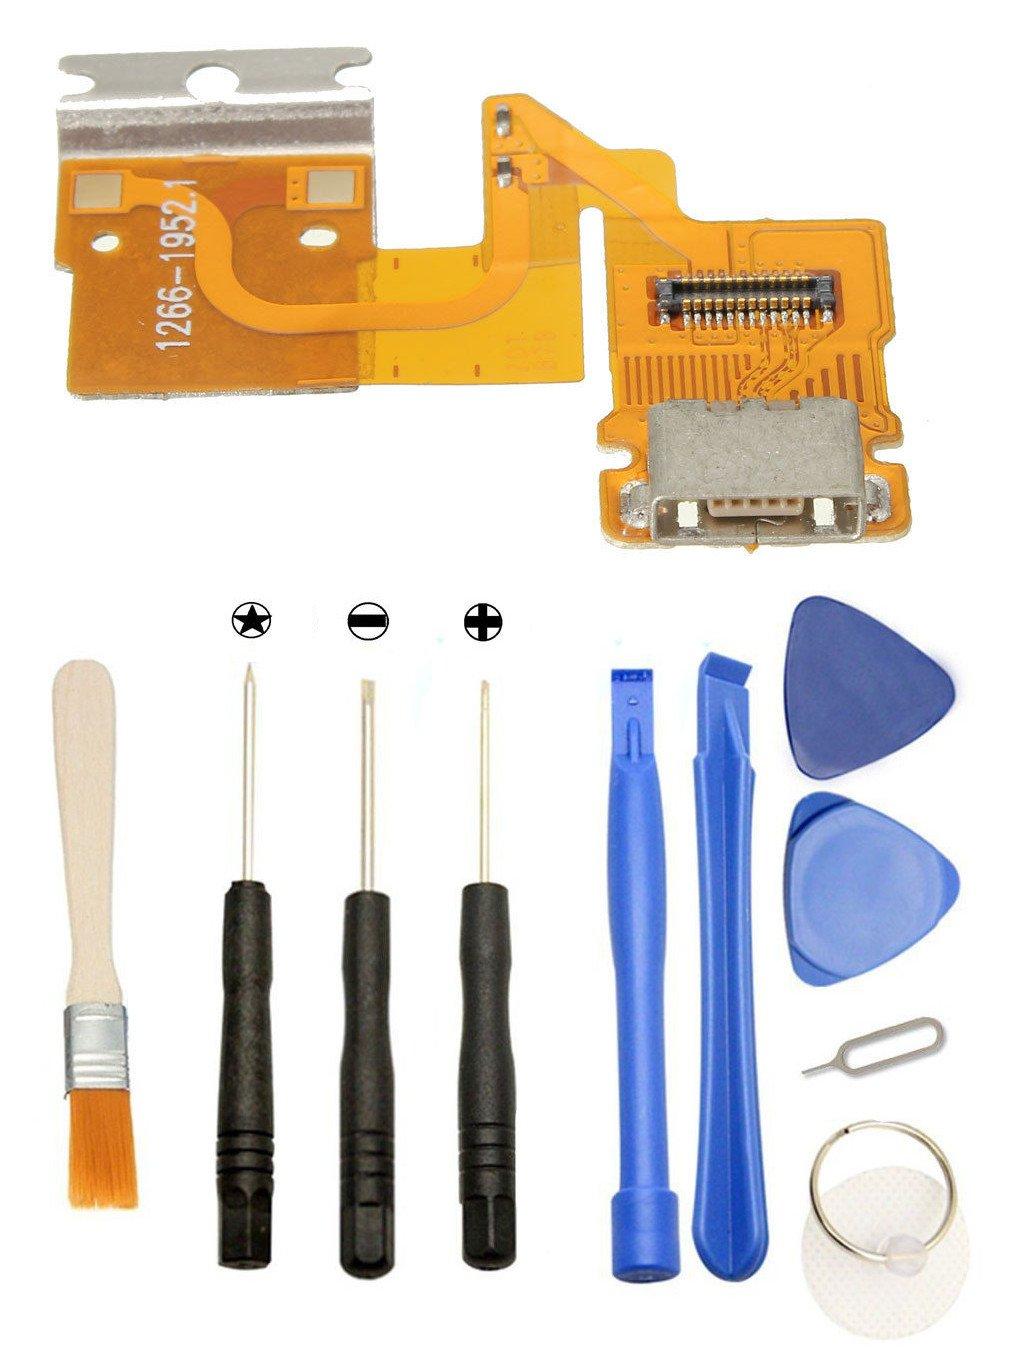 Games&Tech USB Charging Port Connector Flex Cable + Tools for Sony Xperia Tablet Z 3G SGP341 SGP311 SGP312 SGP321 SGP351